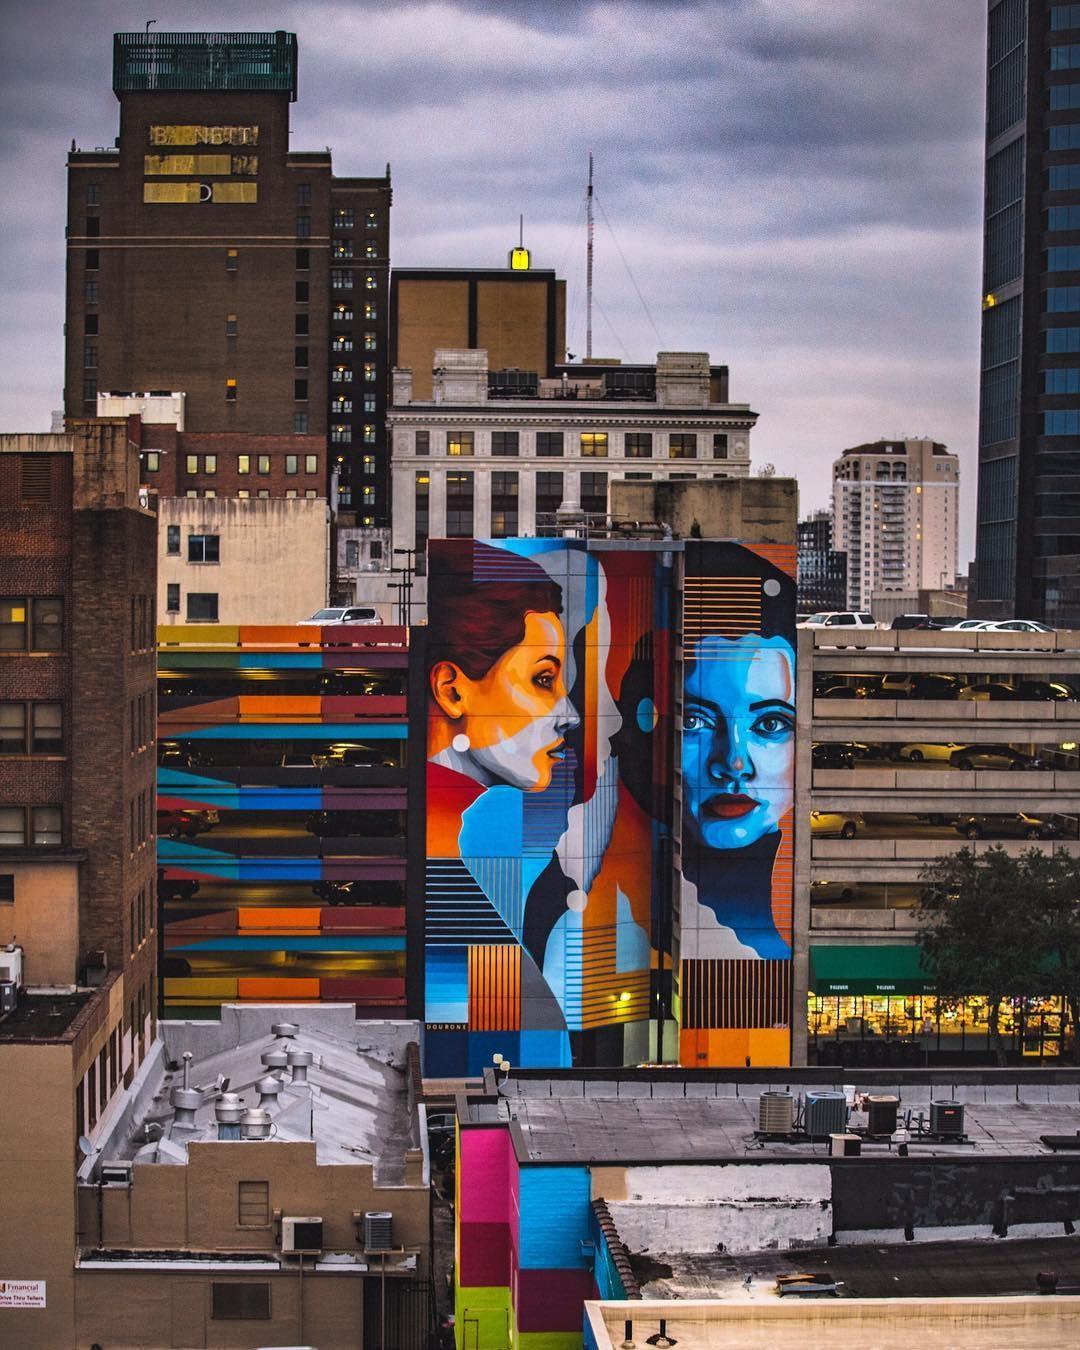 dourone - street art - jacksonville